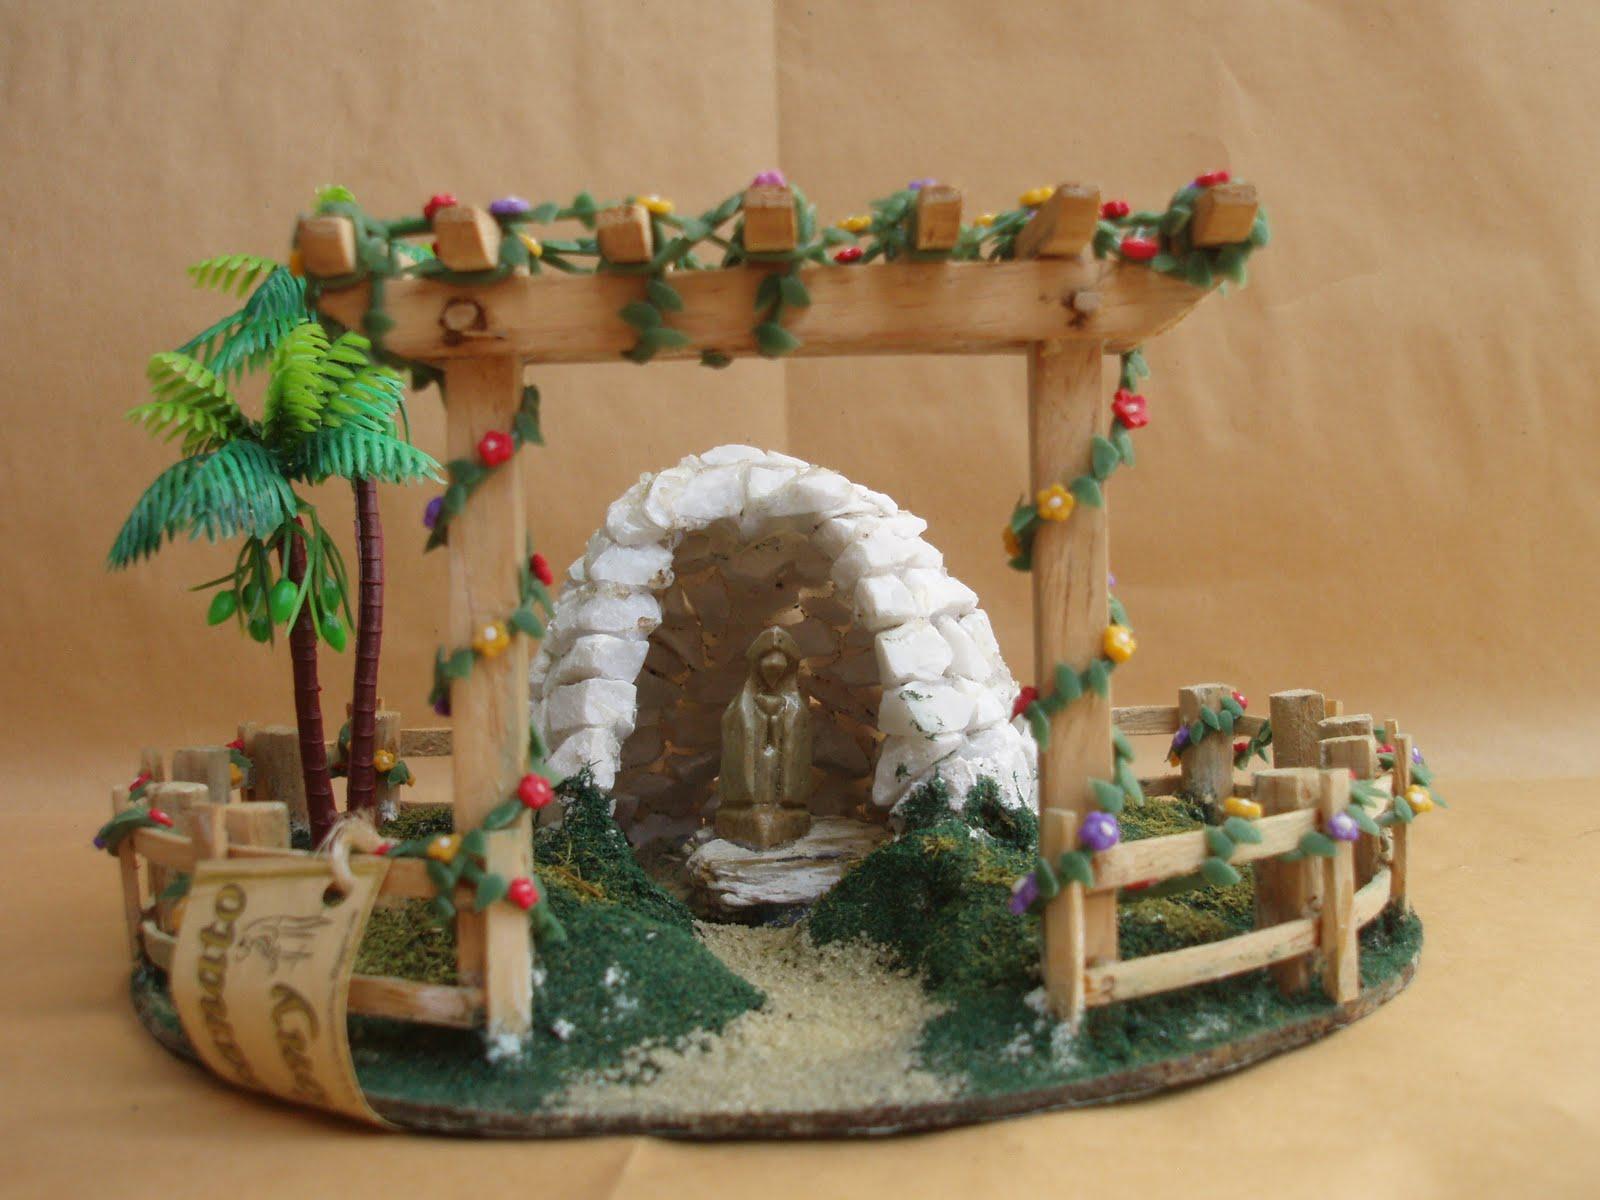 gruta de pedra para jardim:Gruta de Pedra Branca Modelo numero II Com Santa em Pedra Vinda de